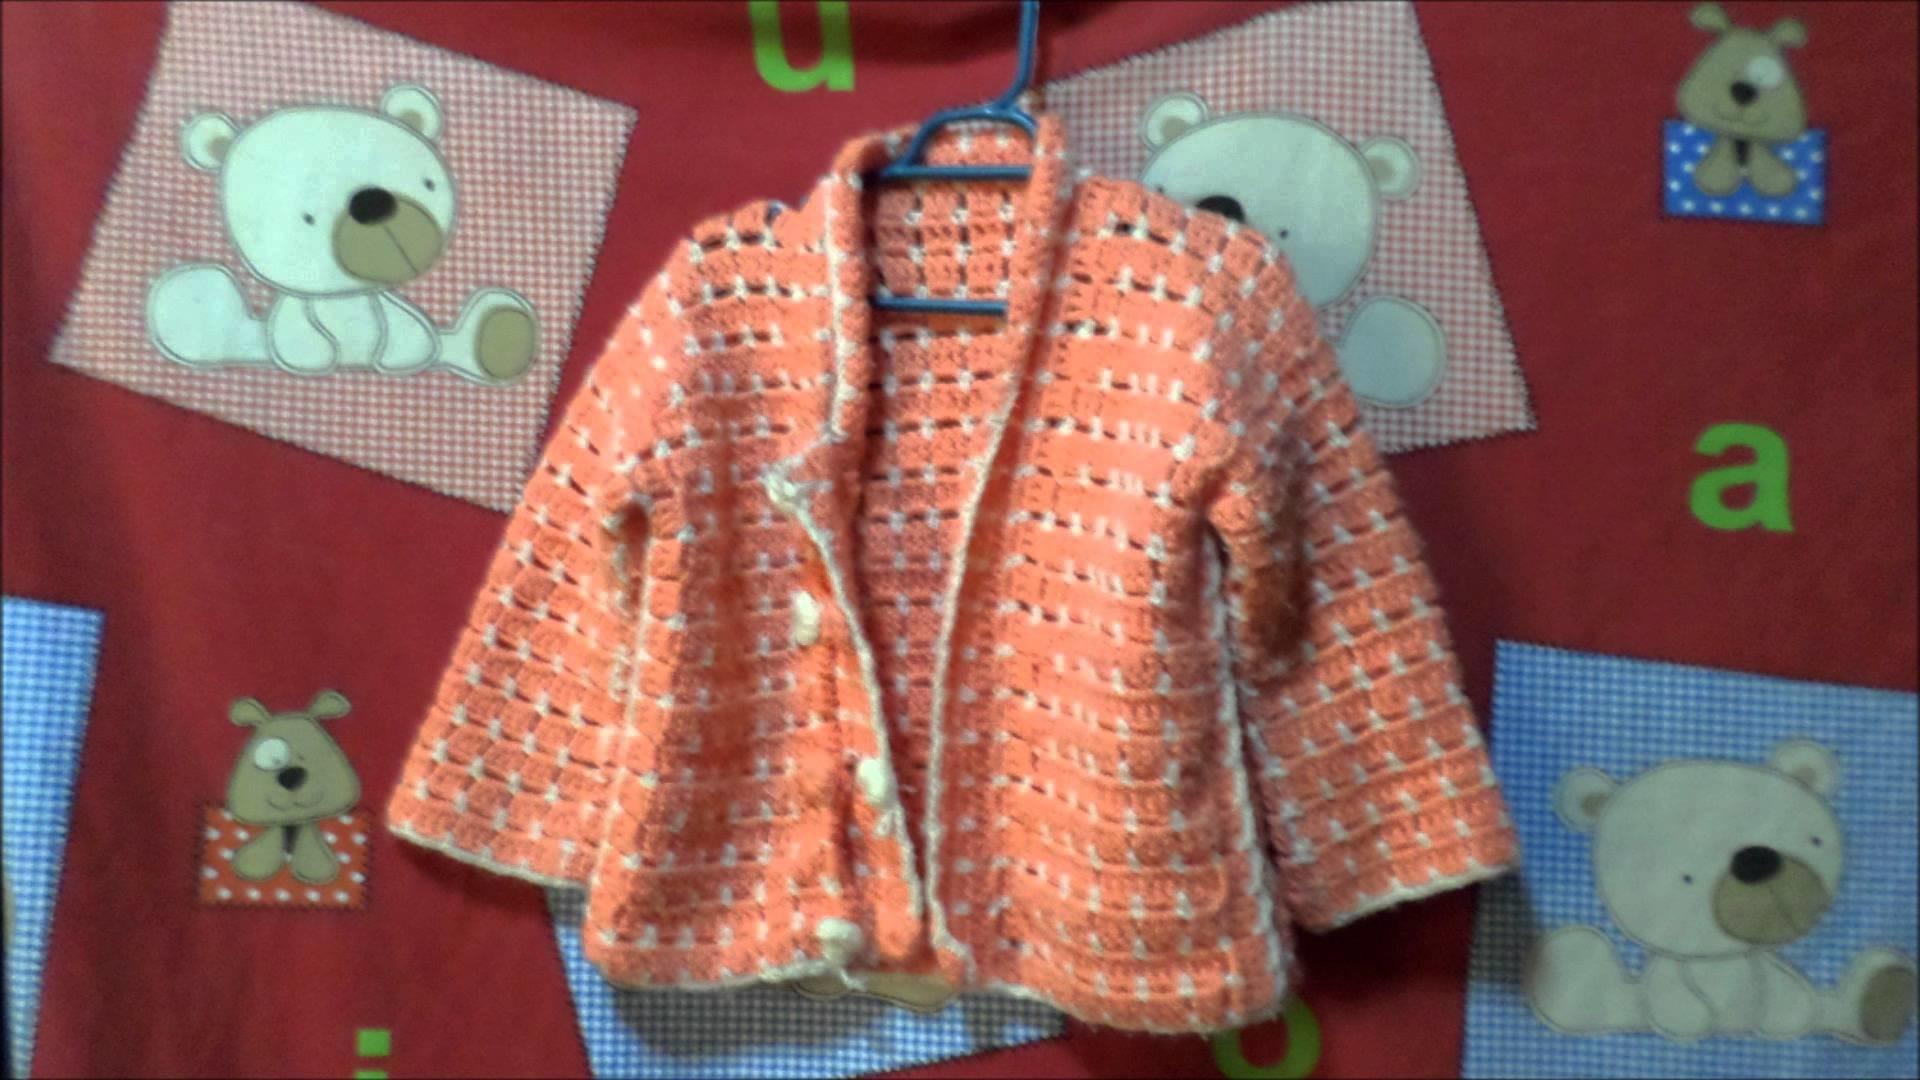 Crochet baby abrigo ,manteau de bébé au crochet,Häkeln Babymantel ,크로 셰 뜨개질 아기 외투,outfit